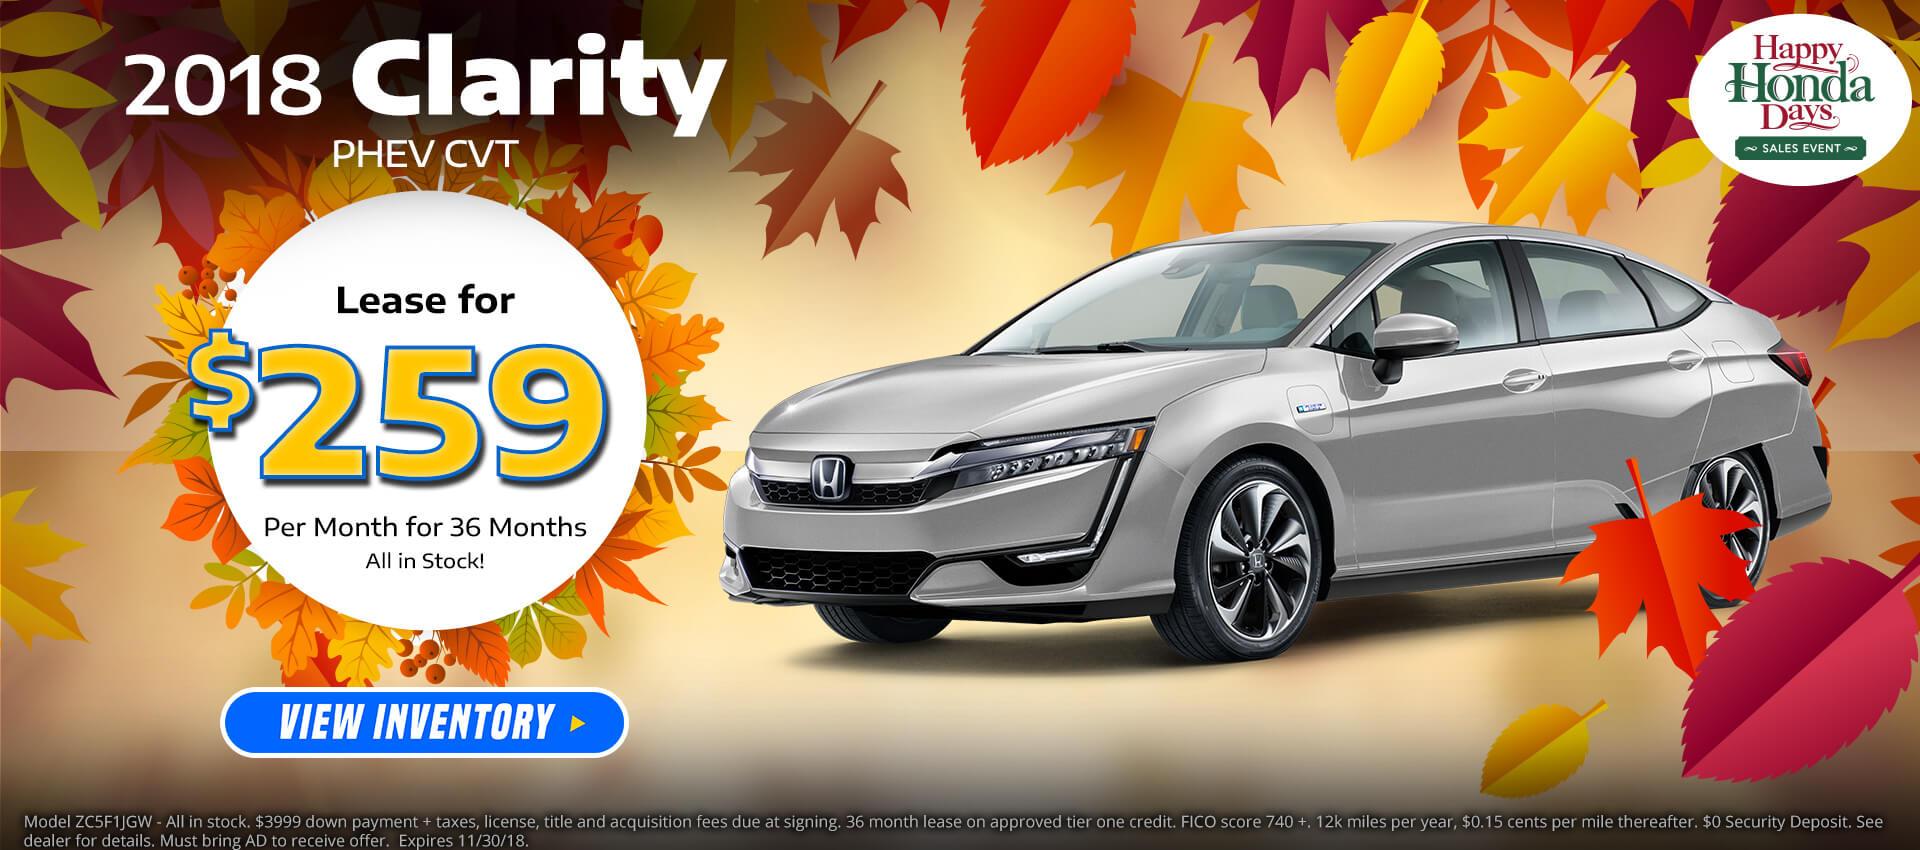 Honda Clarity PHEV $259 Lease